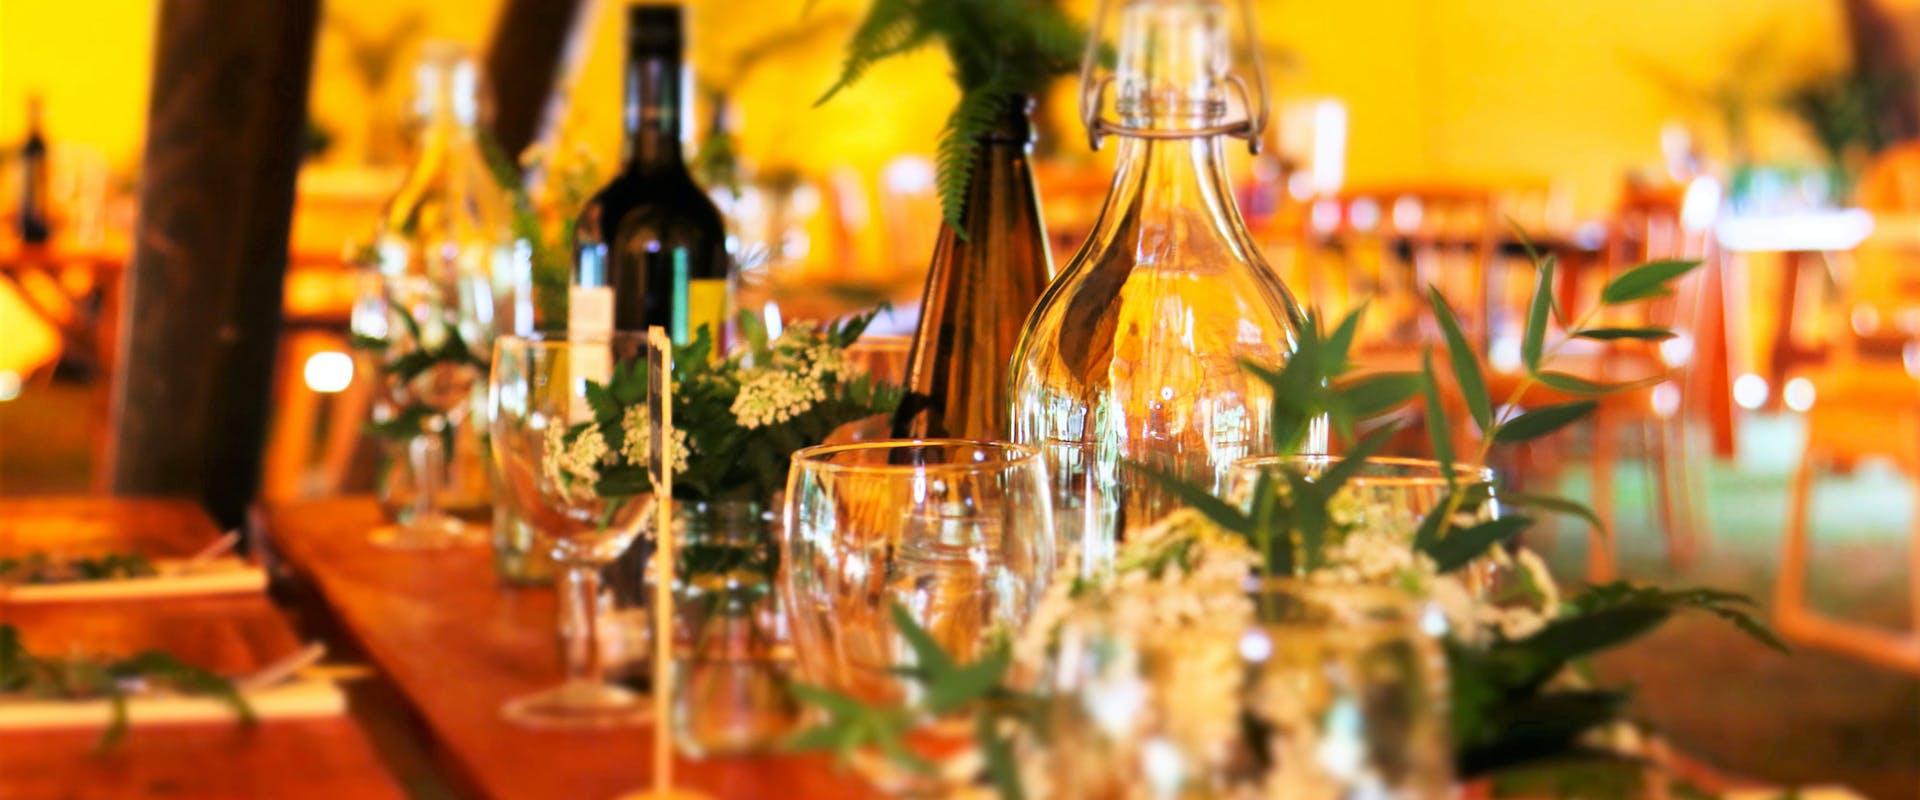 1541695178 bar catering celebra3tion 1243337